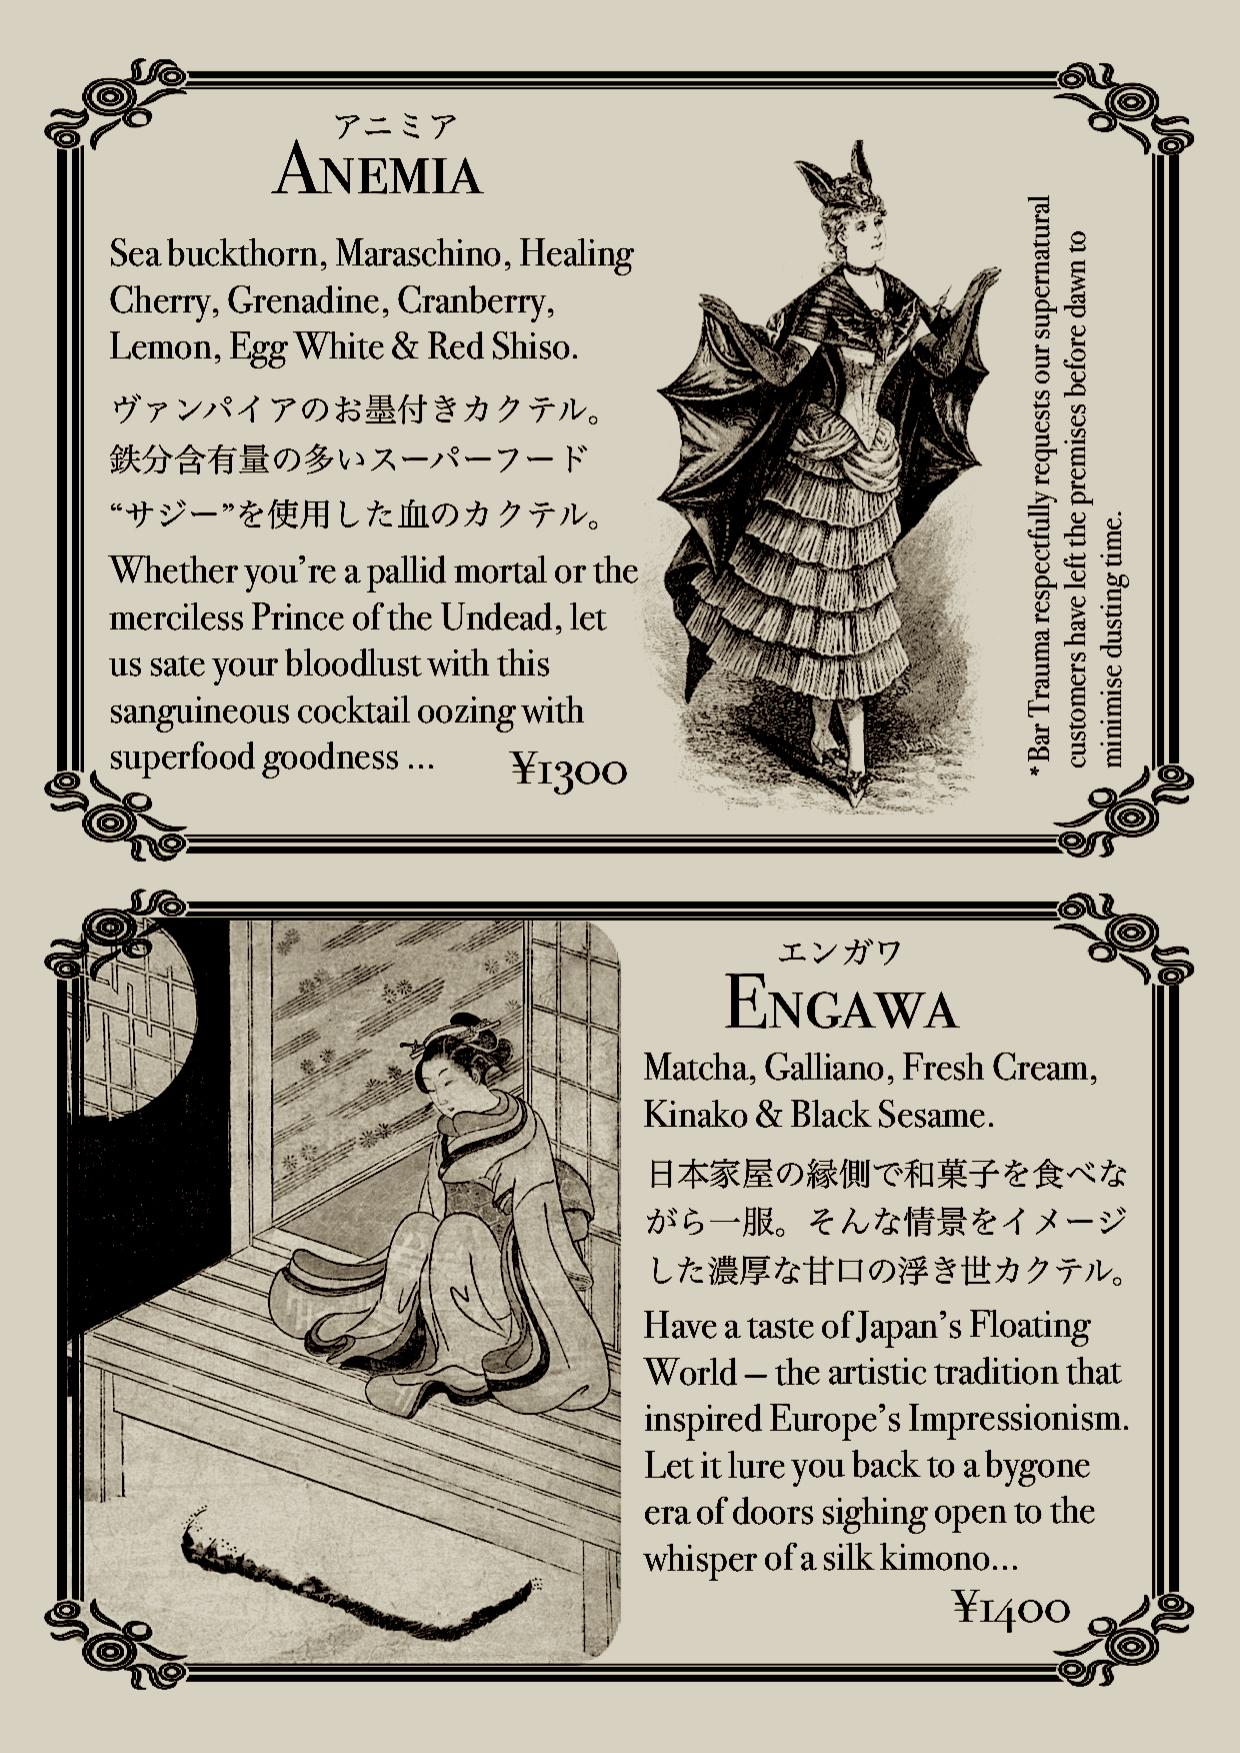 Anemia / Engawa